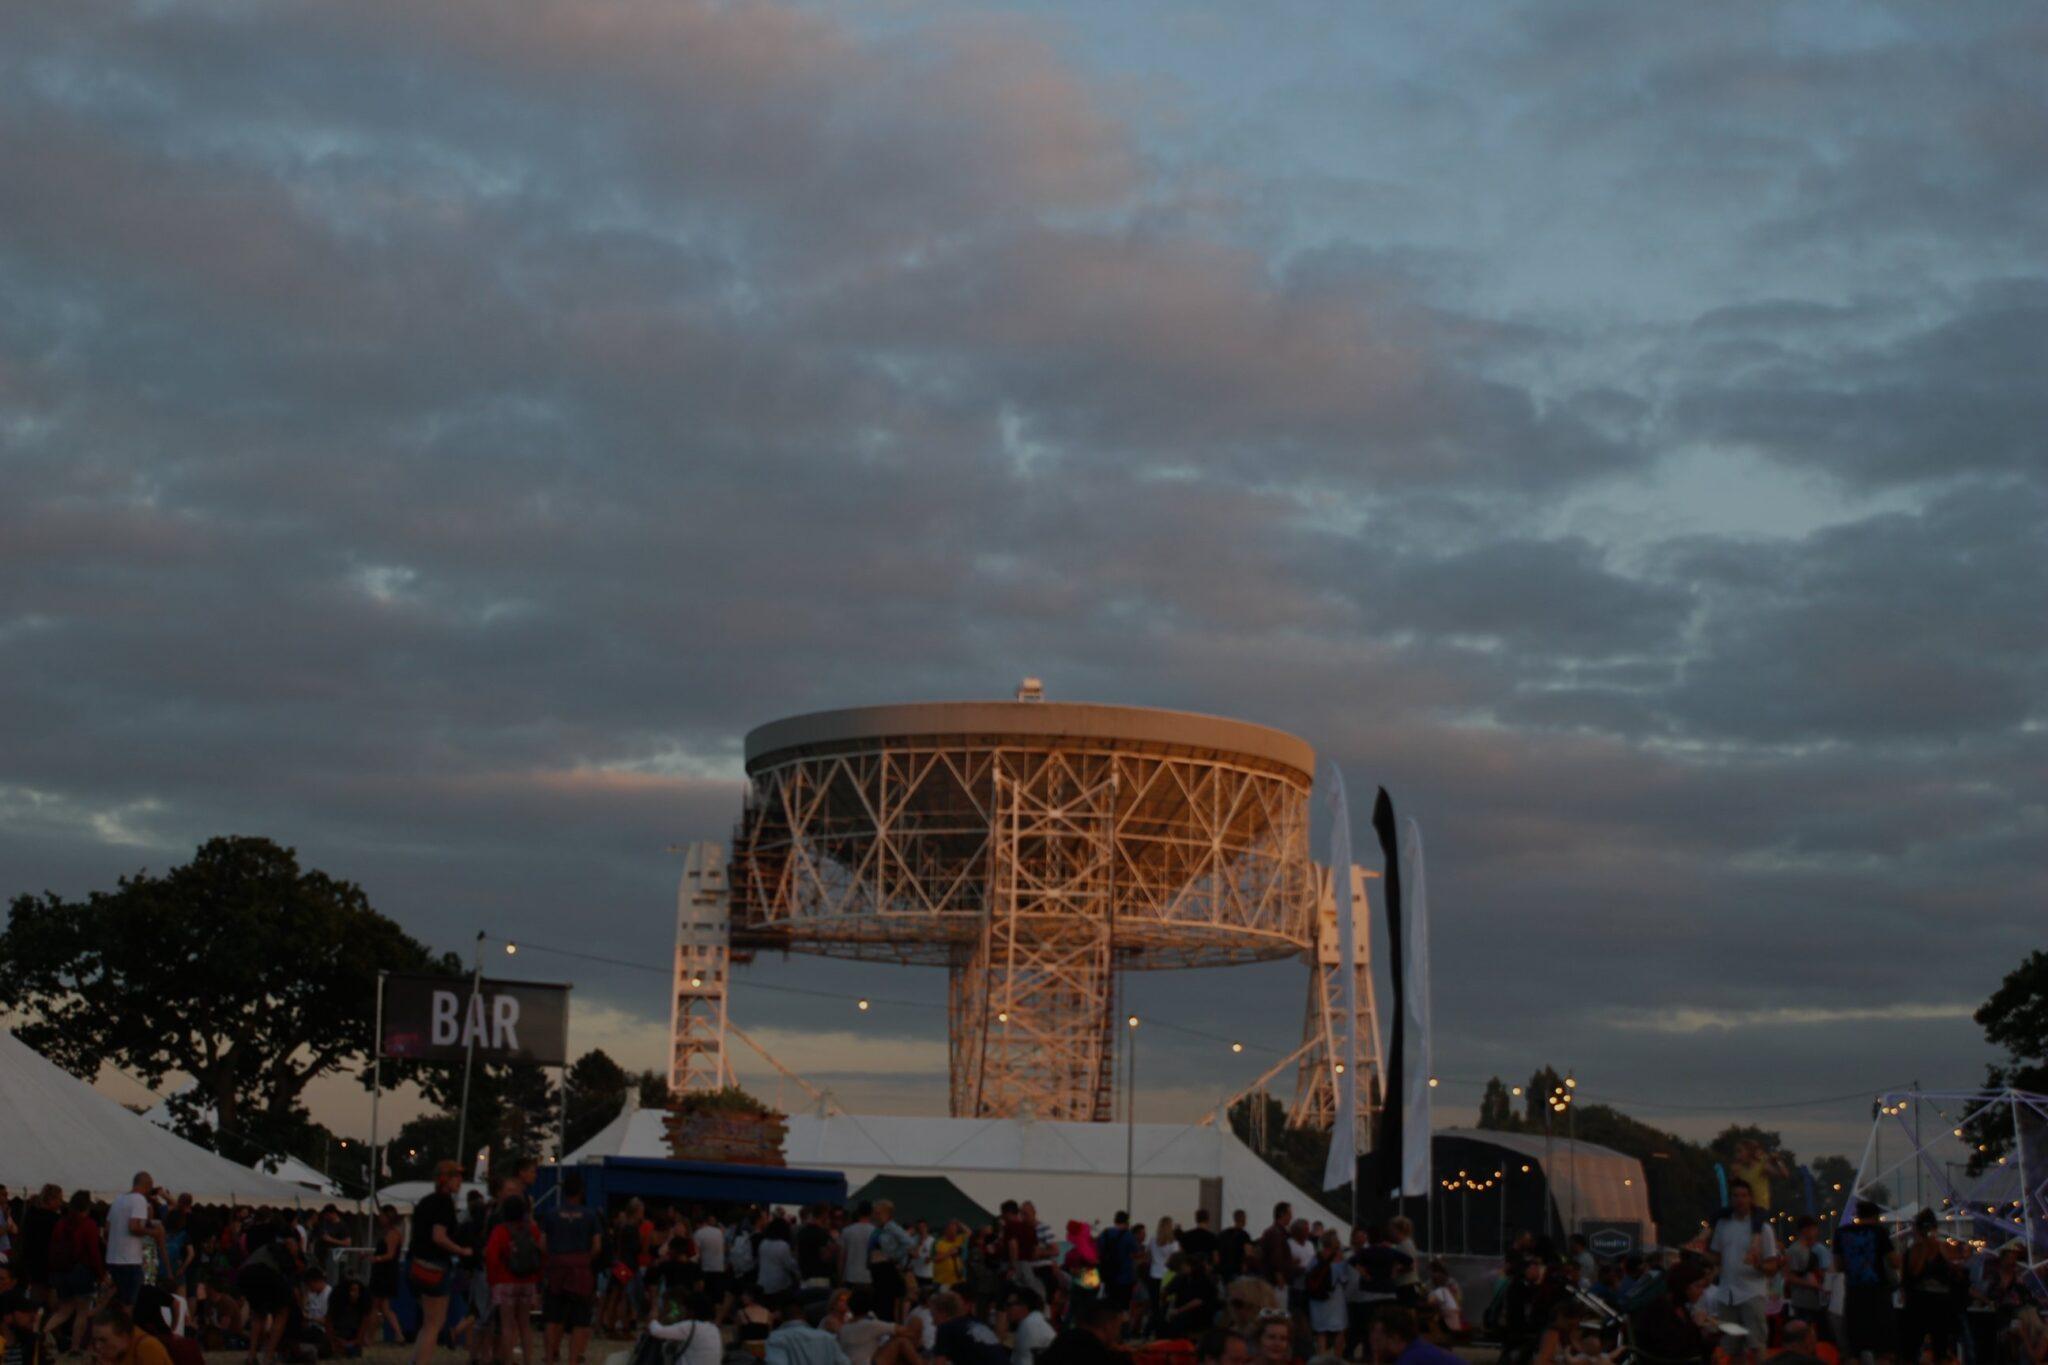 Lovell Telescope at night